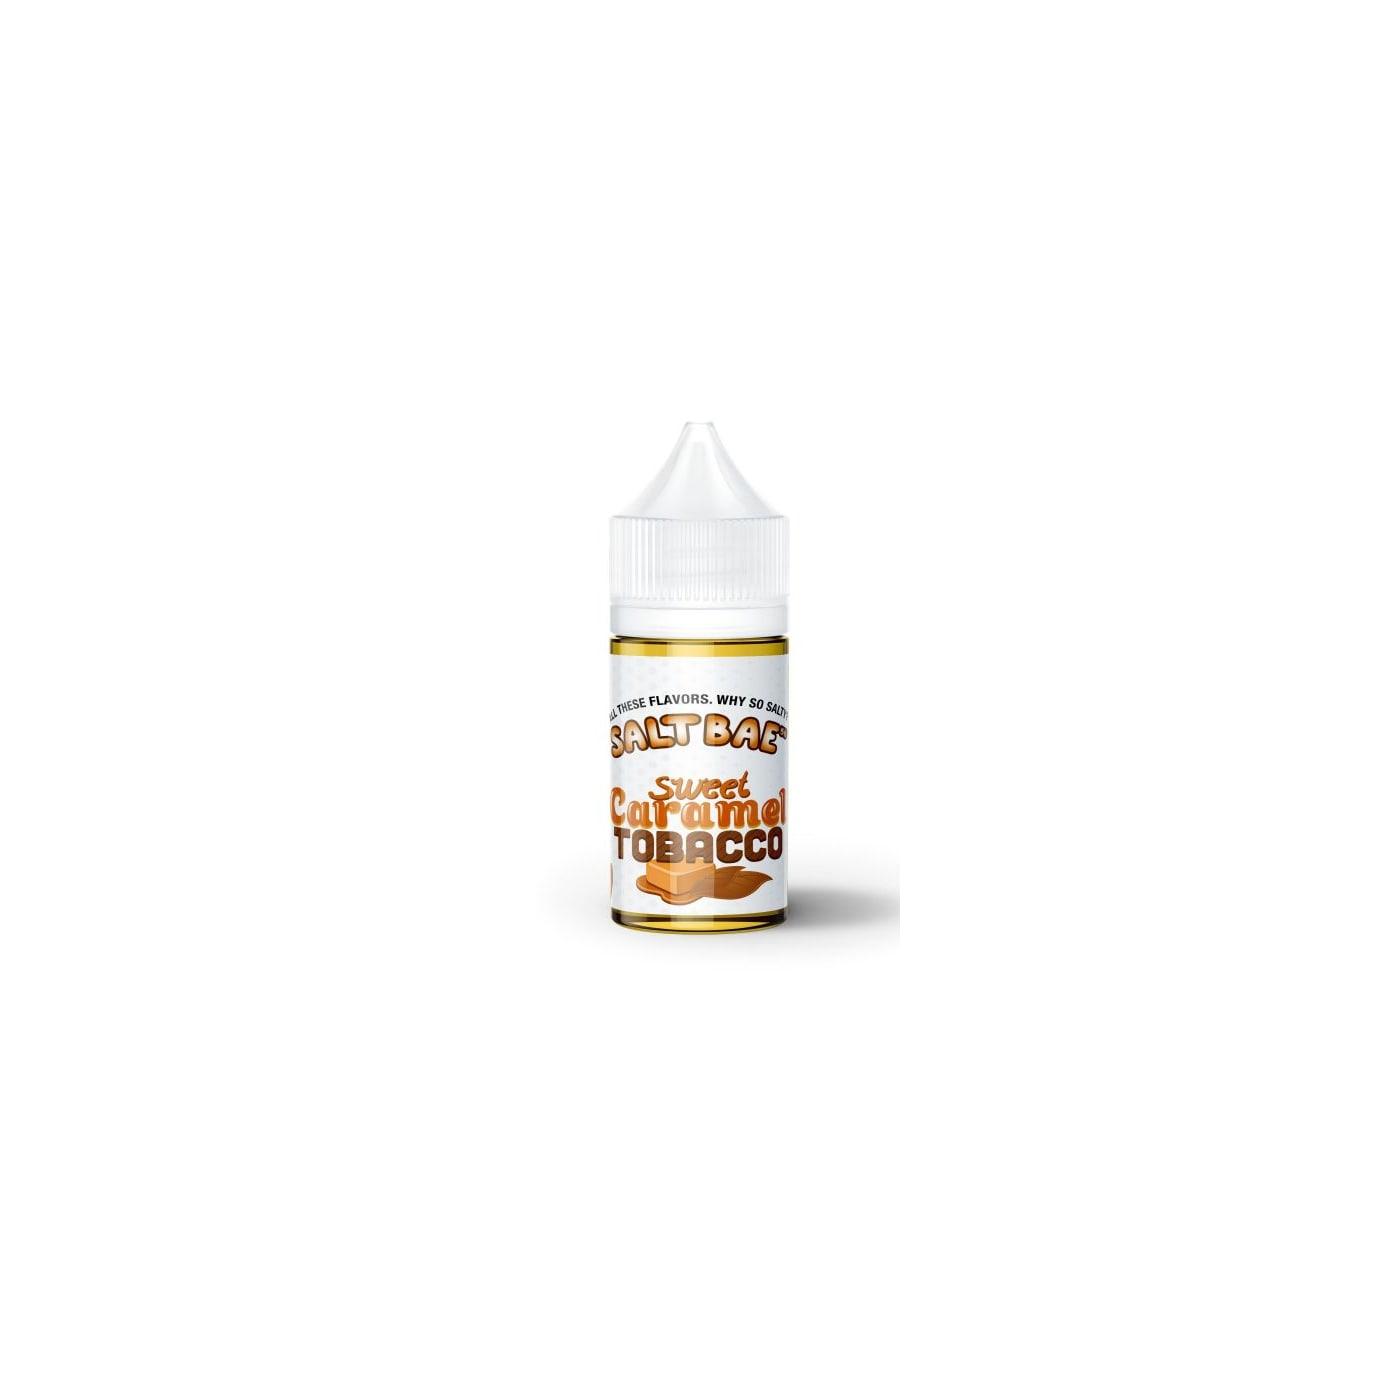 Salt Bae Salts Sweet Caramel Tobacco